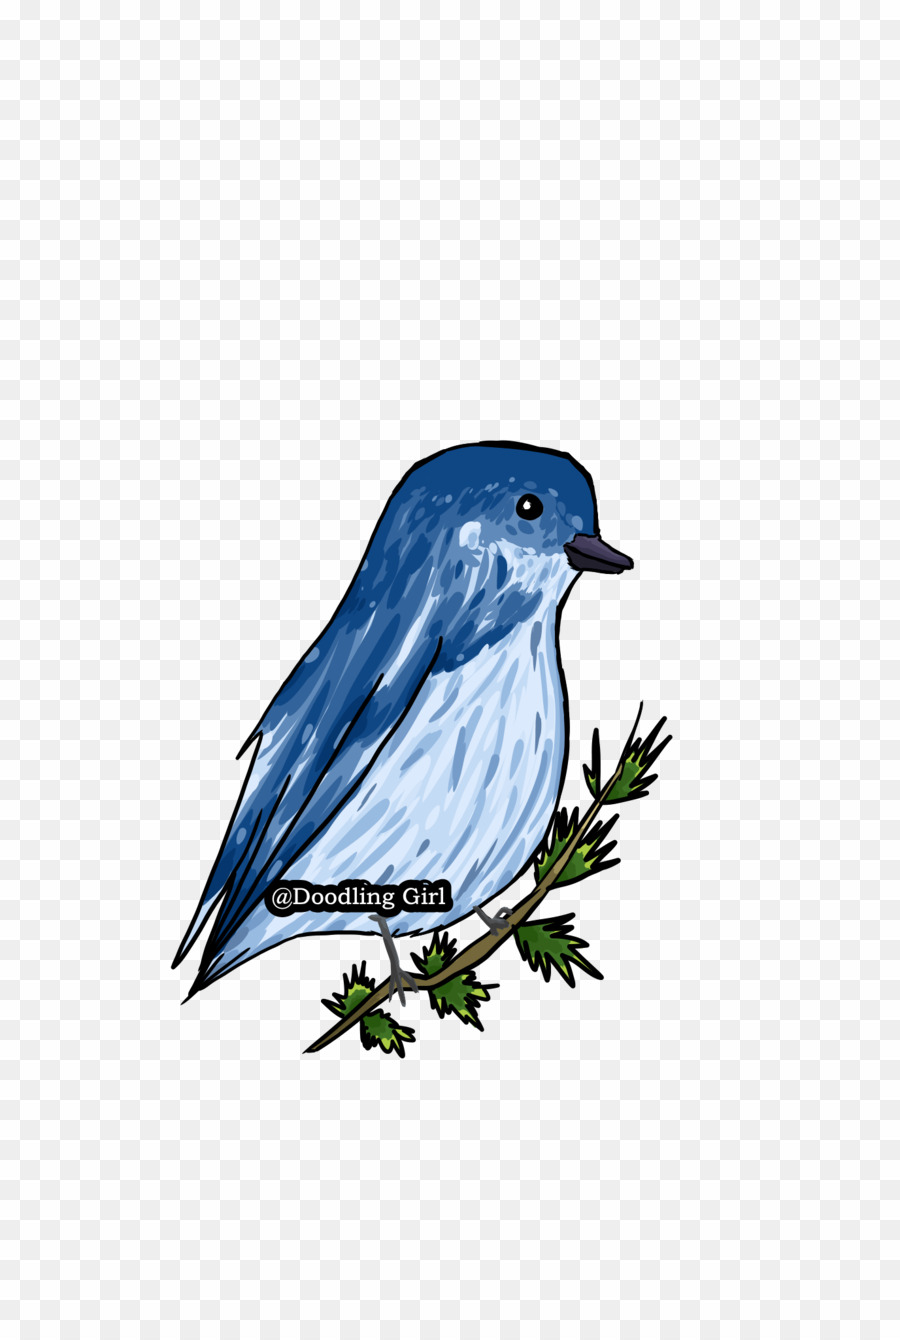 Blue Bird Doodle PNG Bluebirds Clipart download.